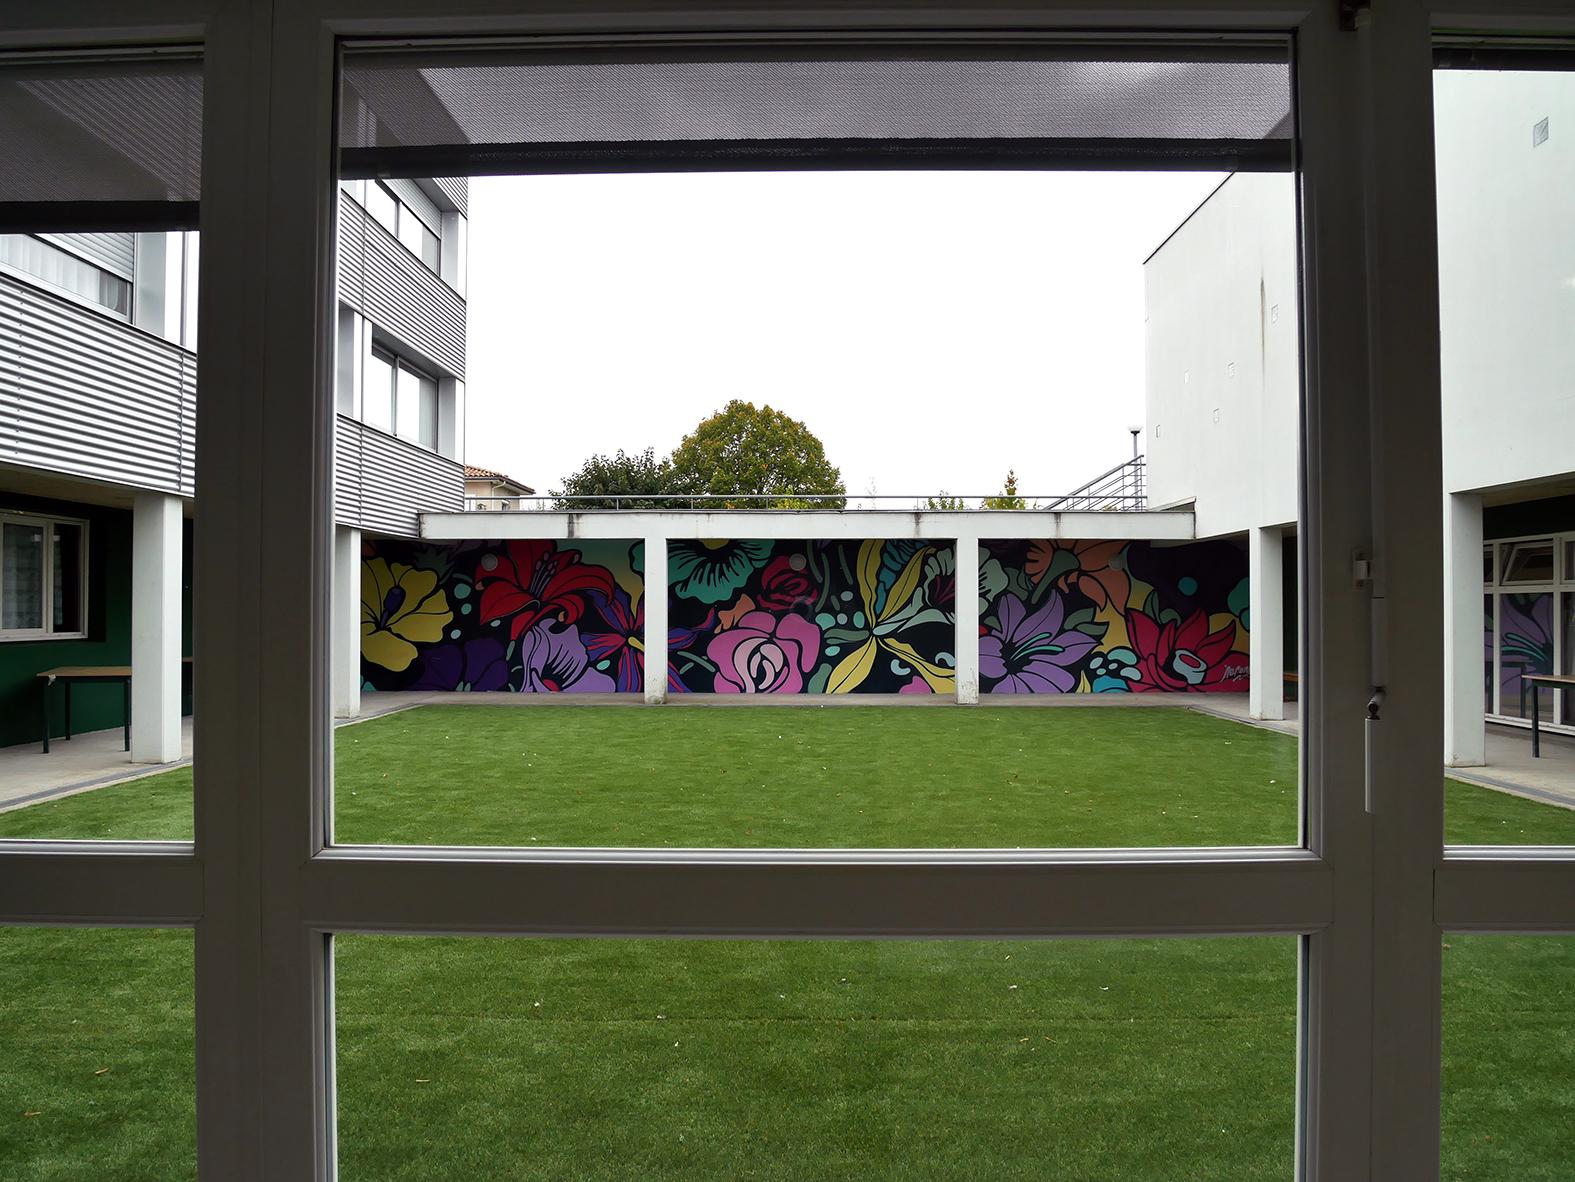 Nerone-art-therapy-street-art-pessac-7